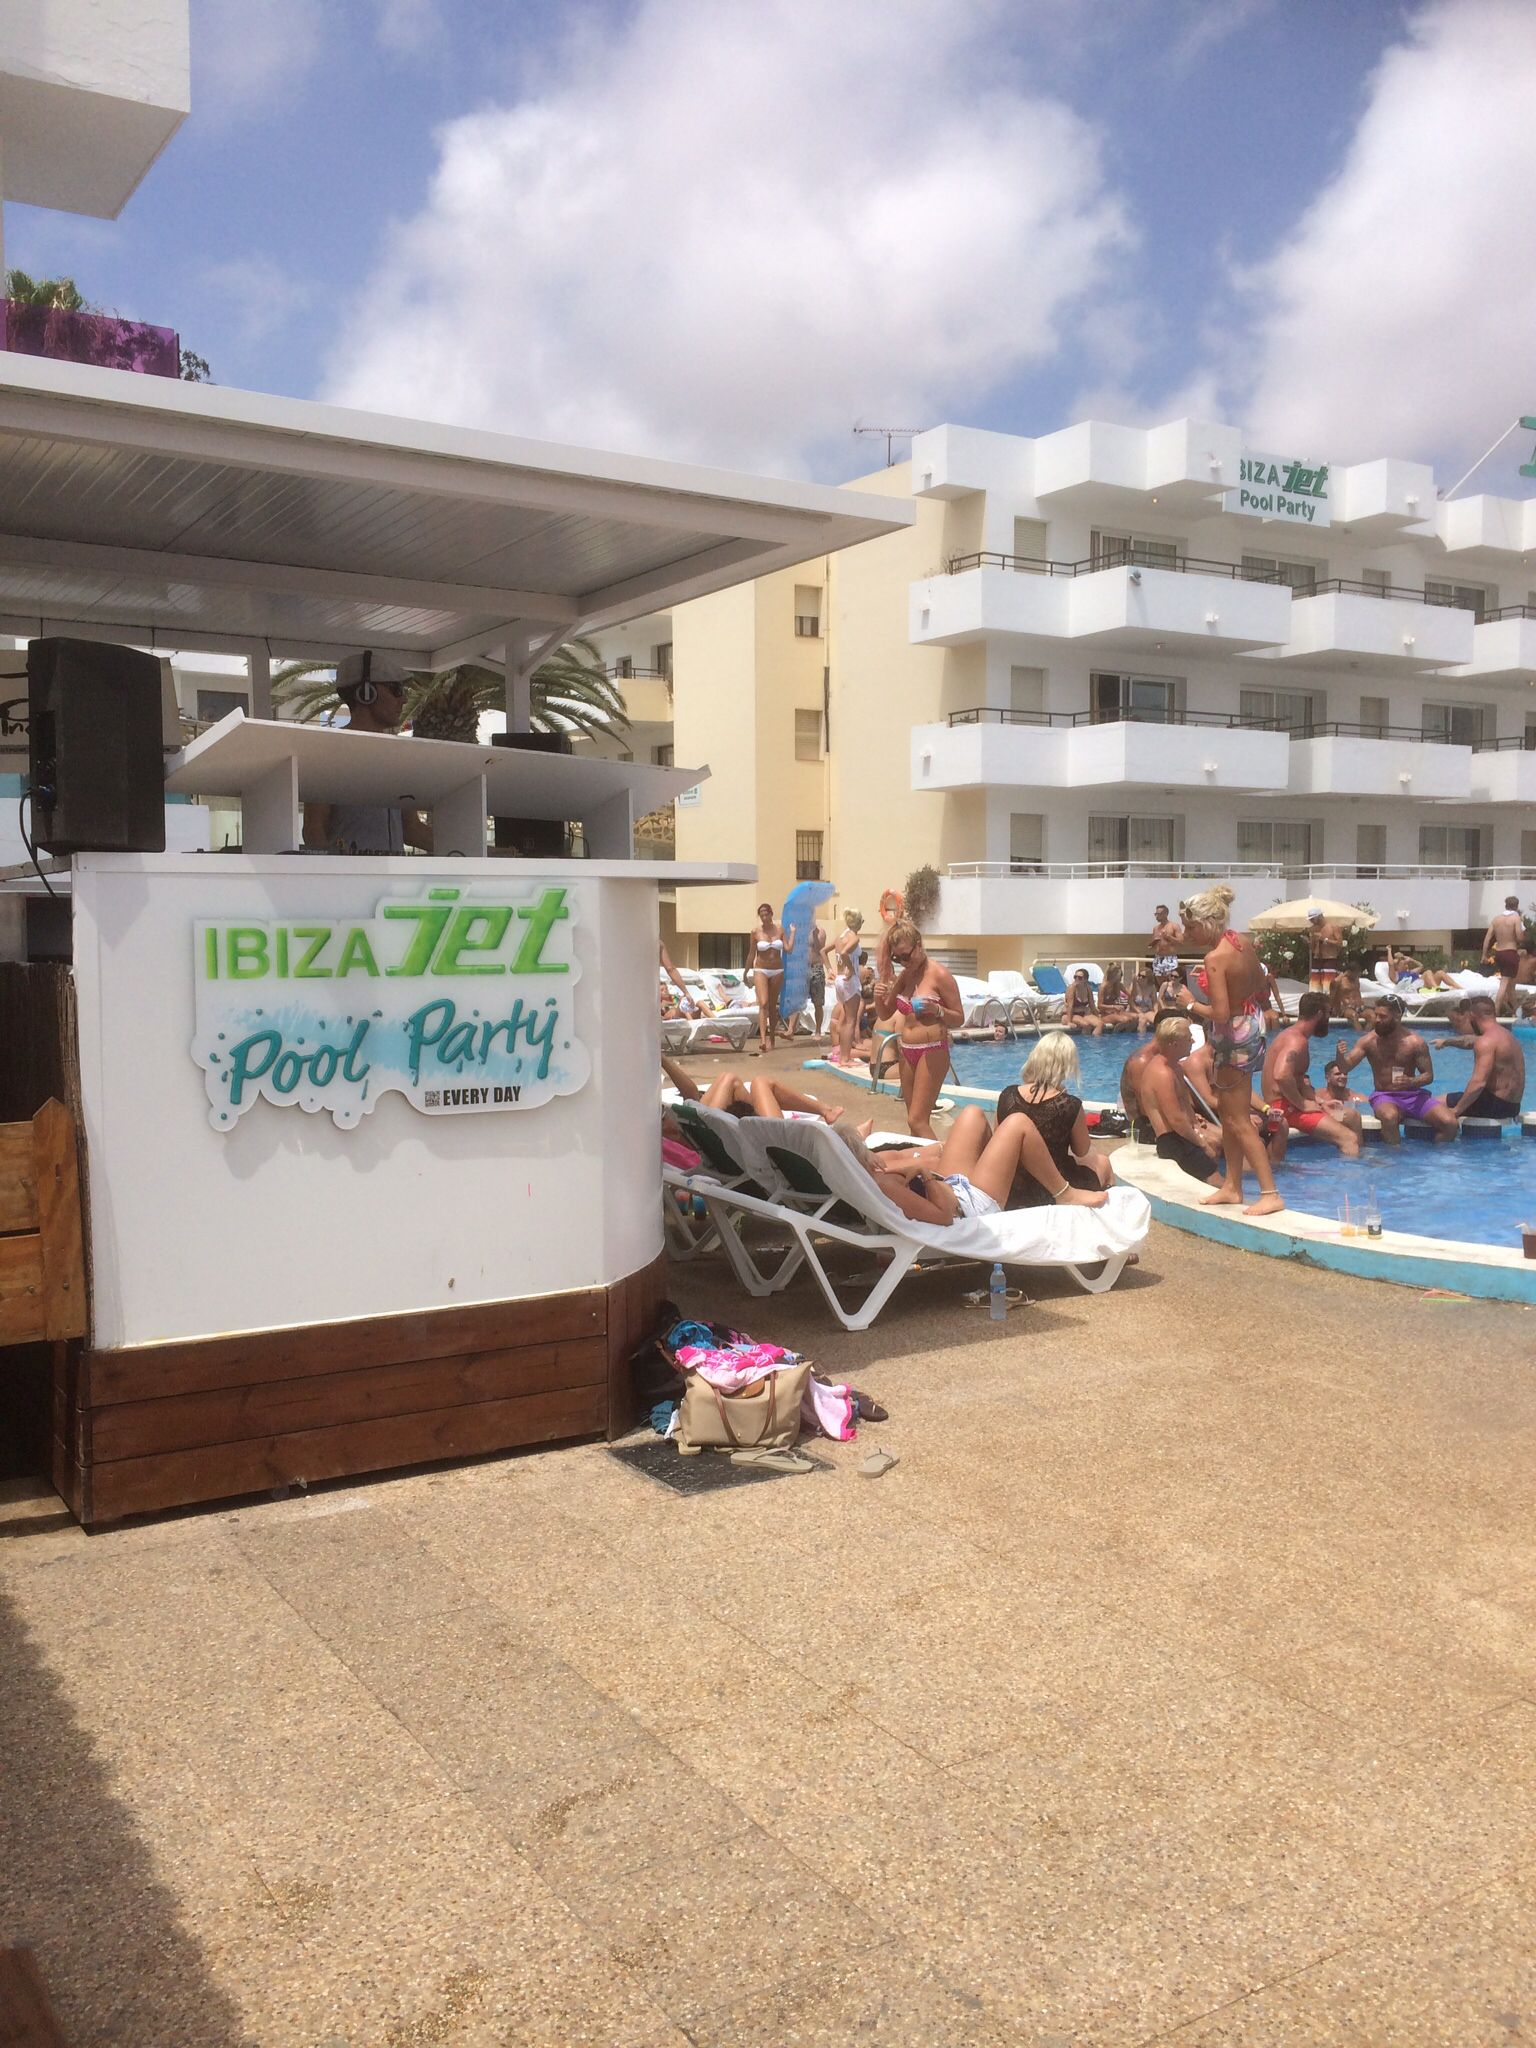 Jet apartment ibiza | Ibiza, Holiday snaps, Pool